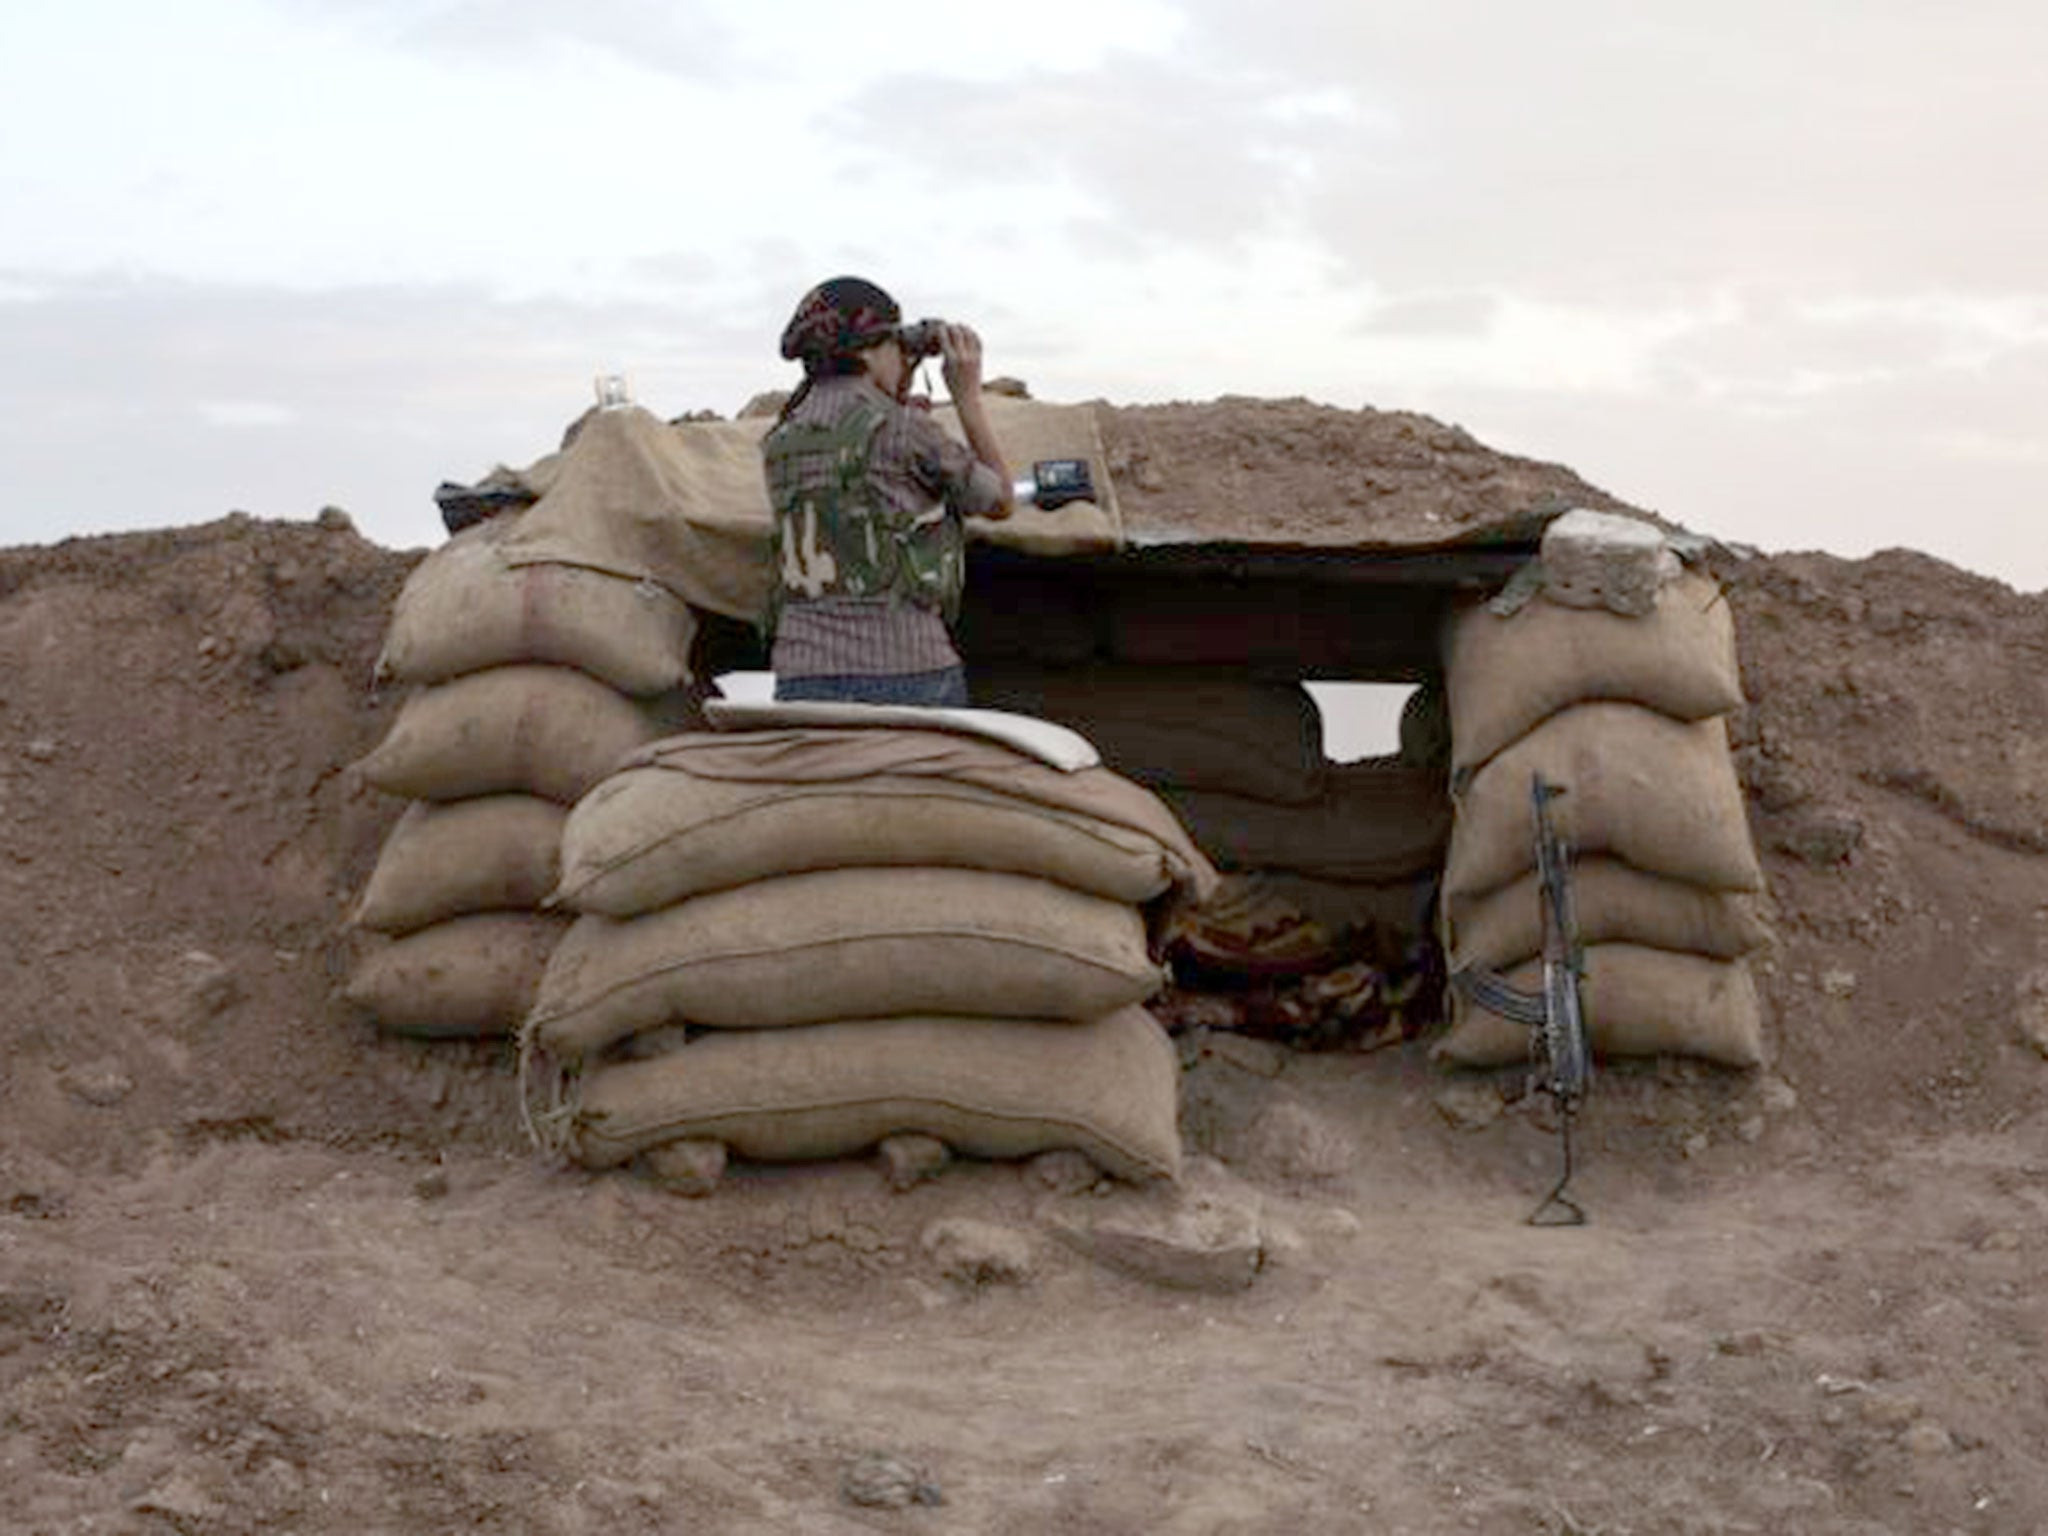 Kurdish-led force seizes Isis stronghold in northeast Syria